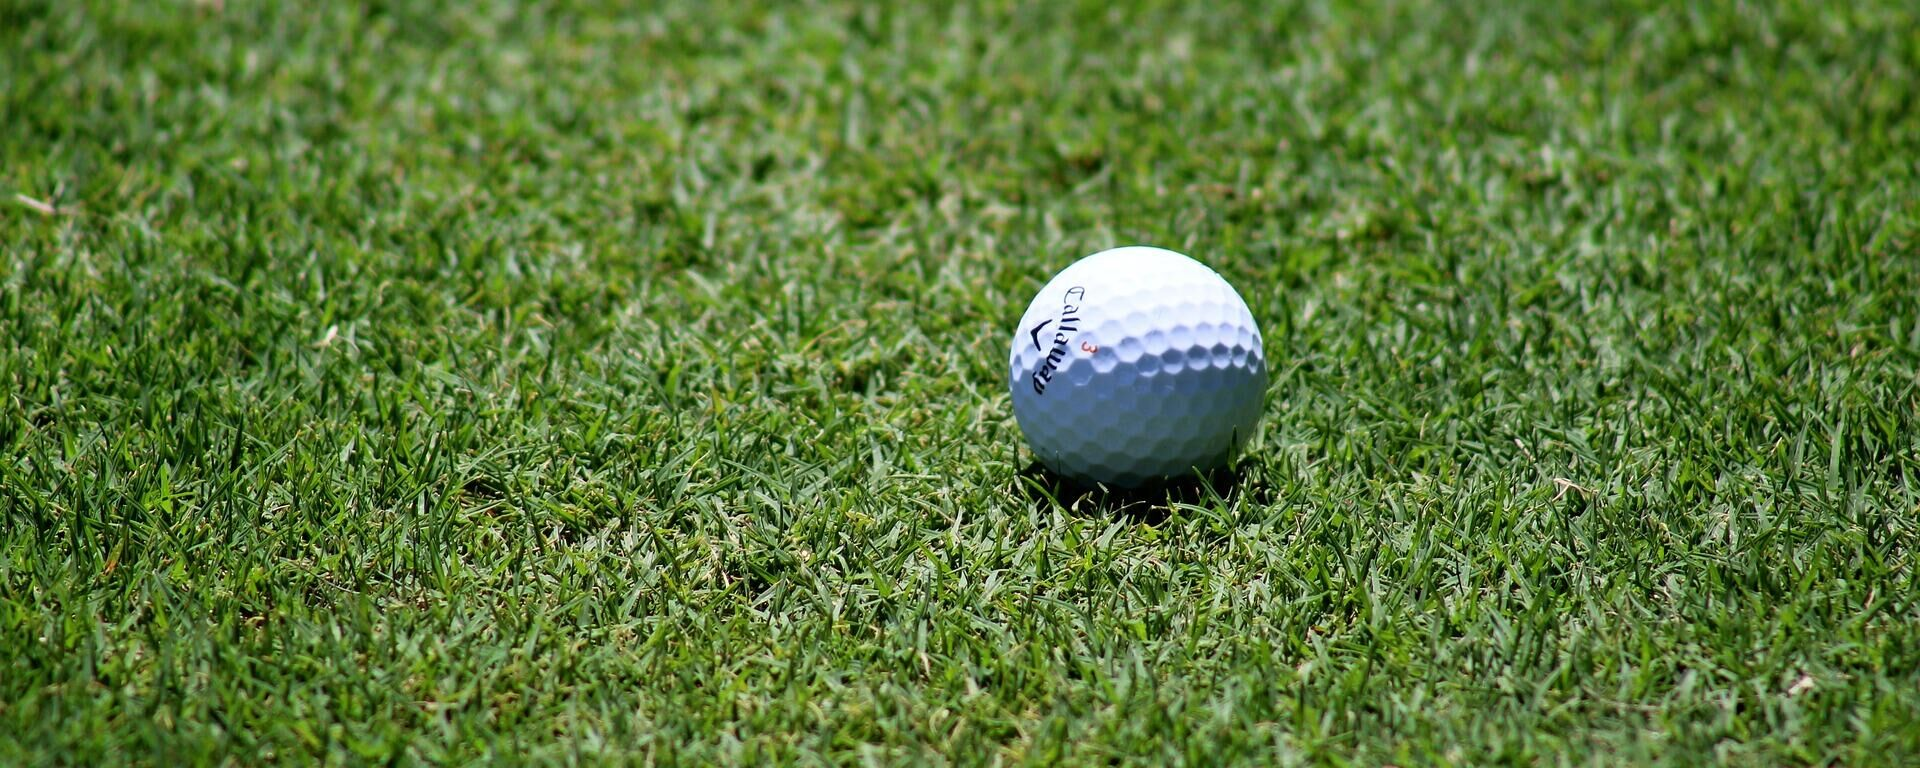 Golf (Symbolbild) - SNA, 1920, 05.07.2021